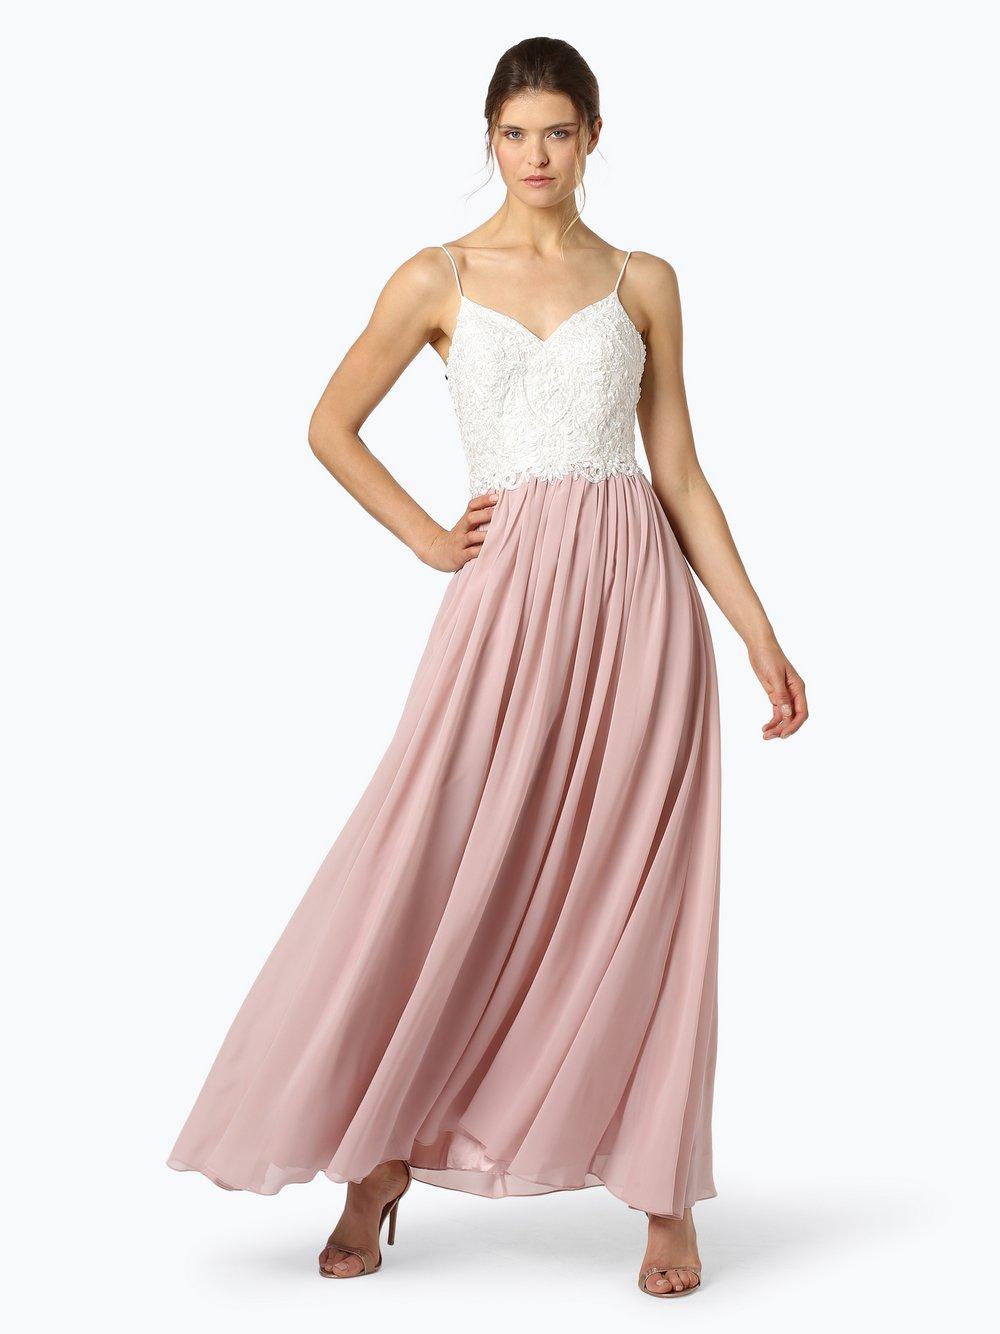 Laona – Damska sukienka wieczorowa, różowy Van Graaf 443709-0001